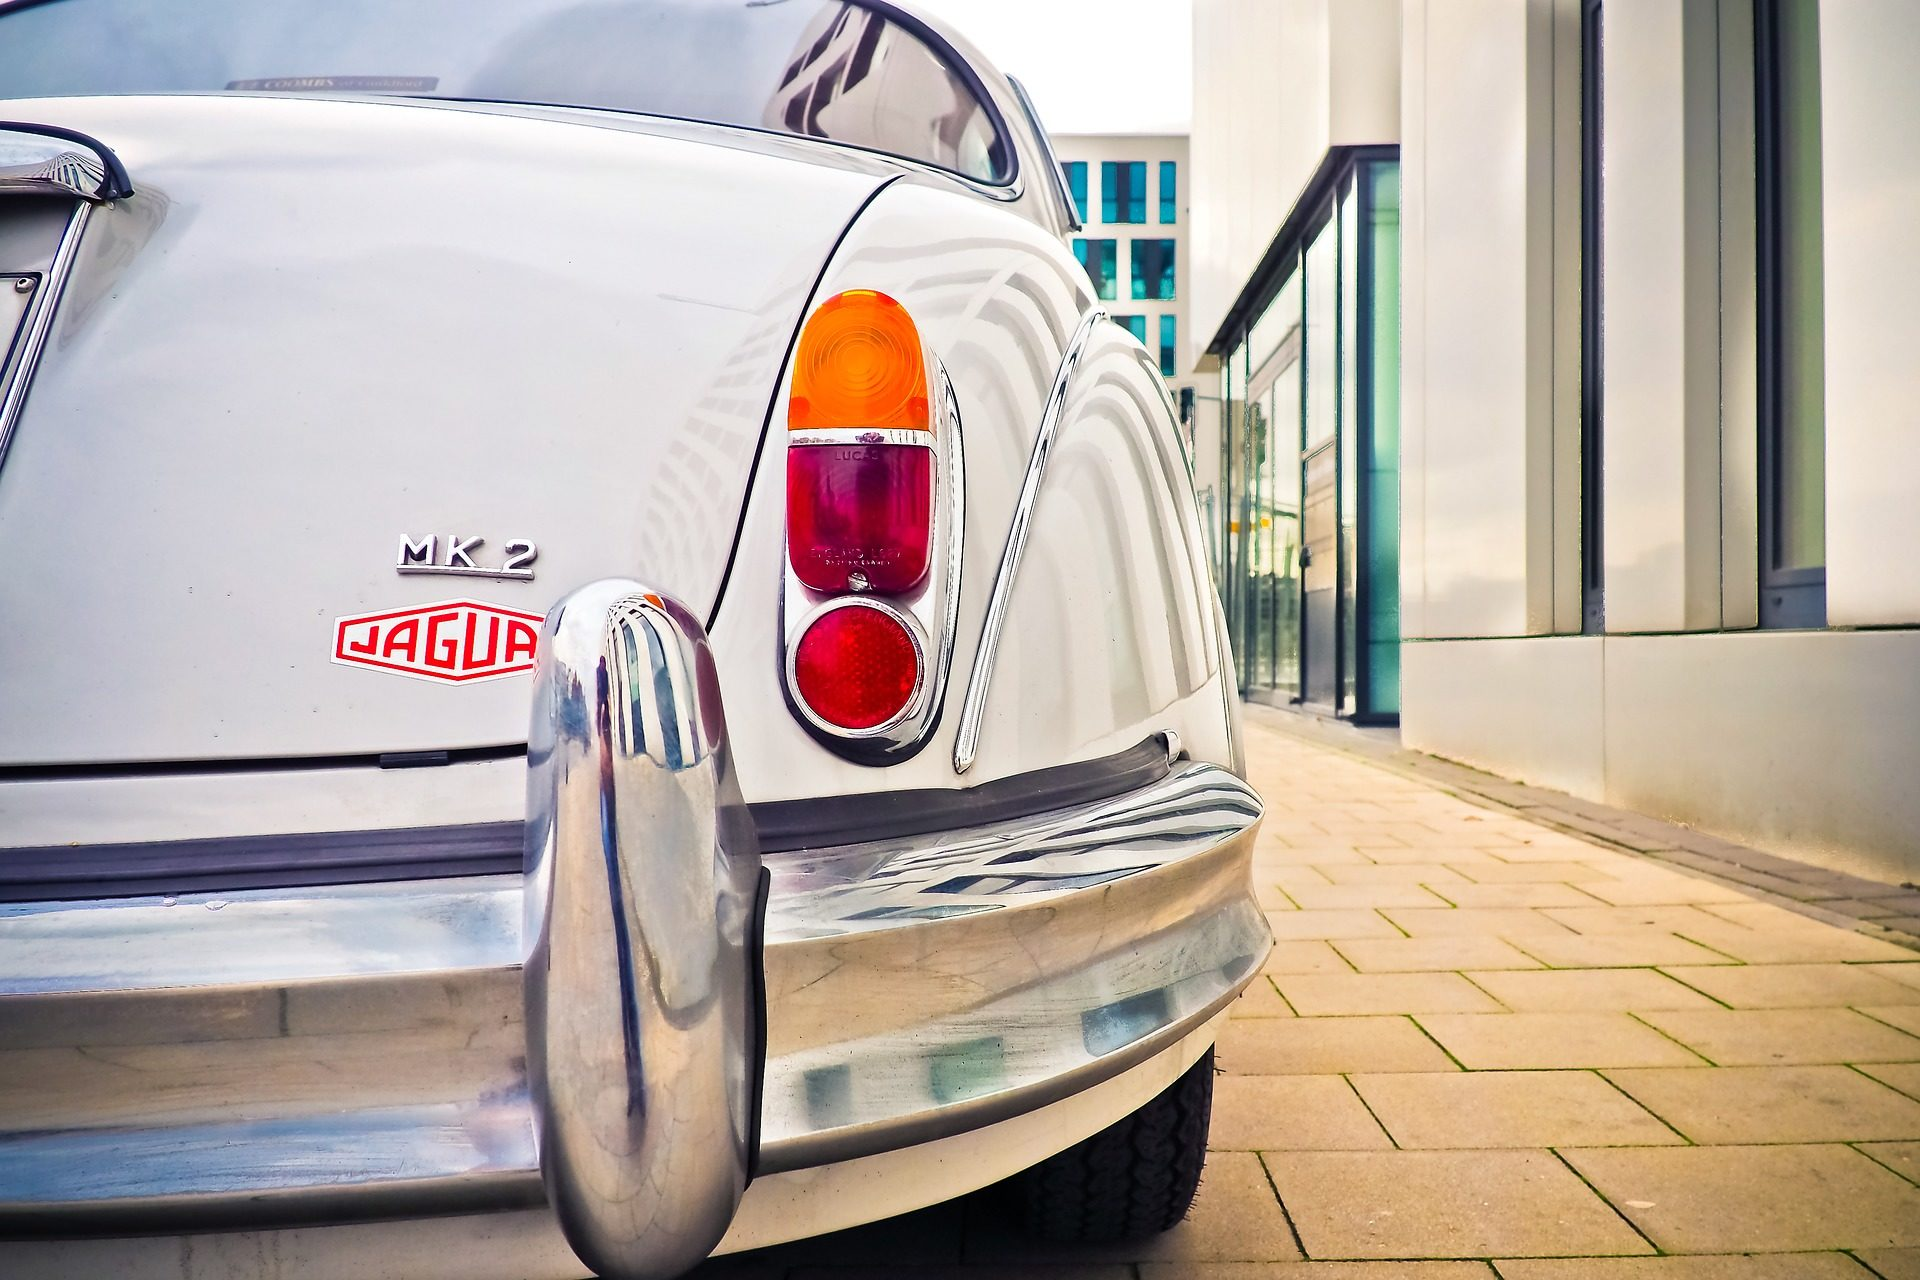 coche, antiguo, clásico, vintage, jaguar, parachoques - Fondos de Pantalla HD - professor-falken.com